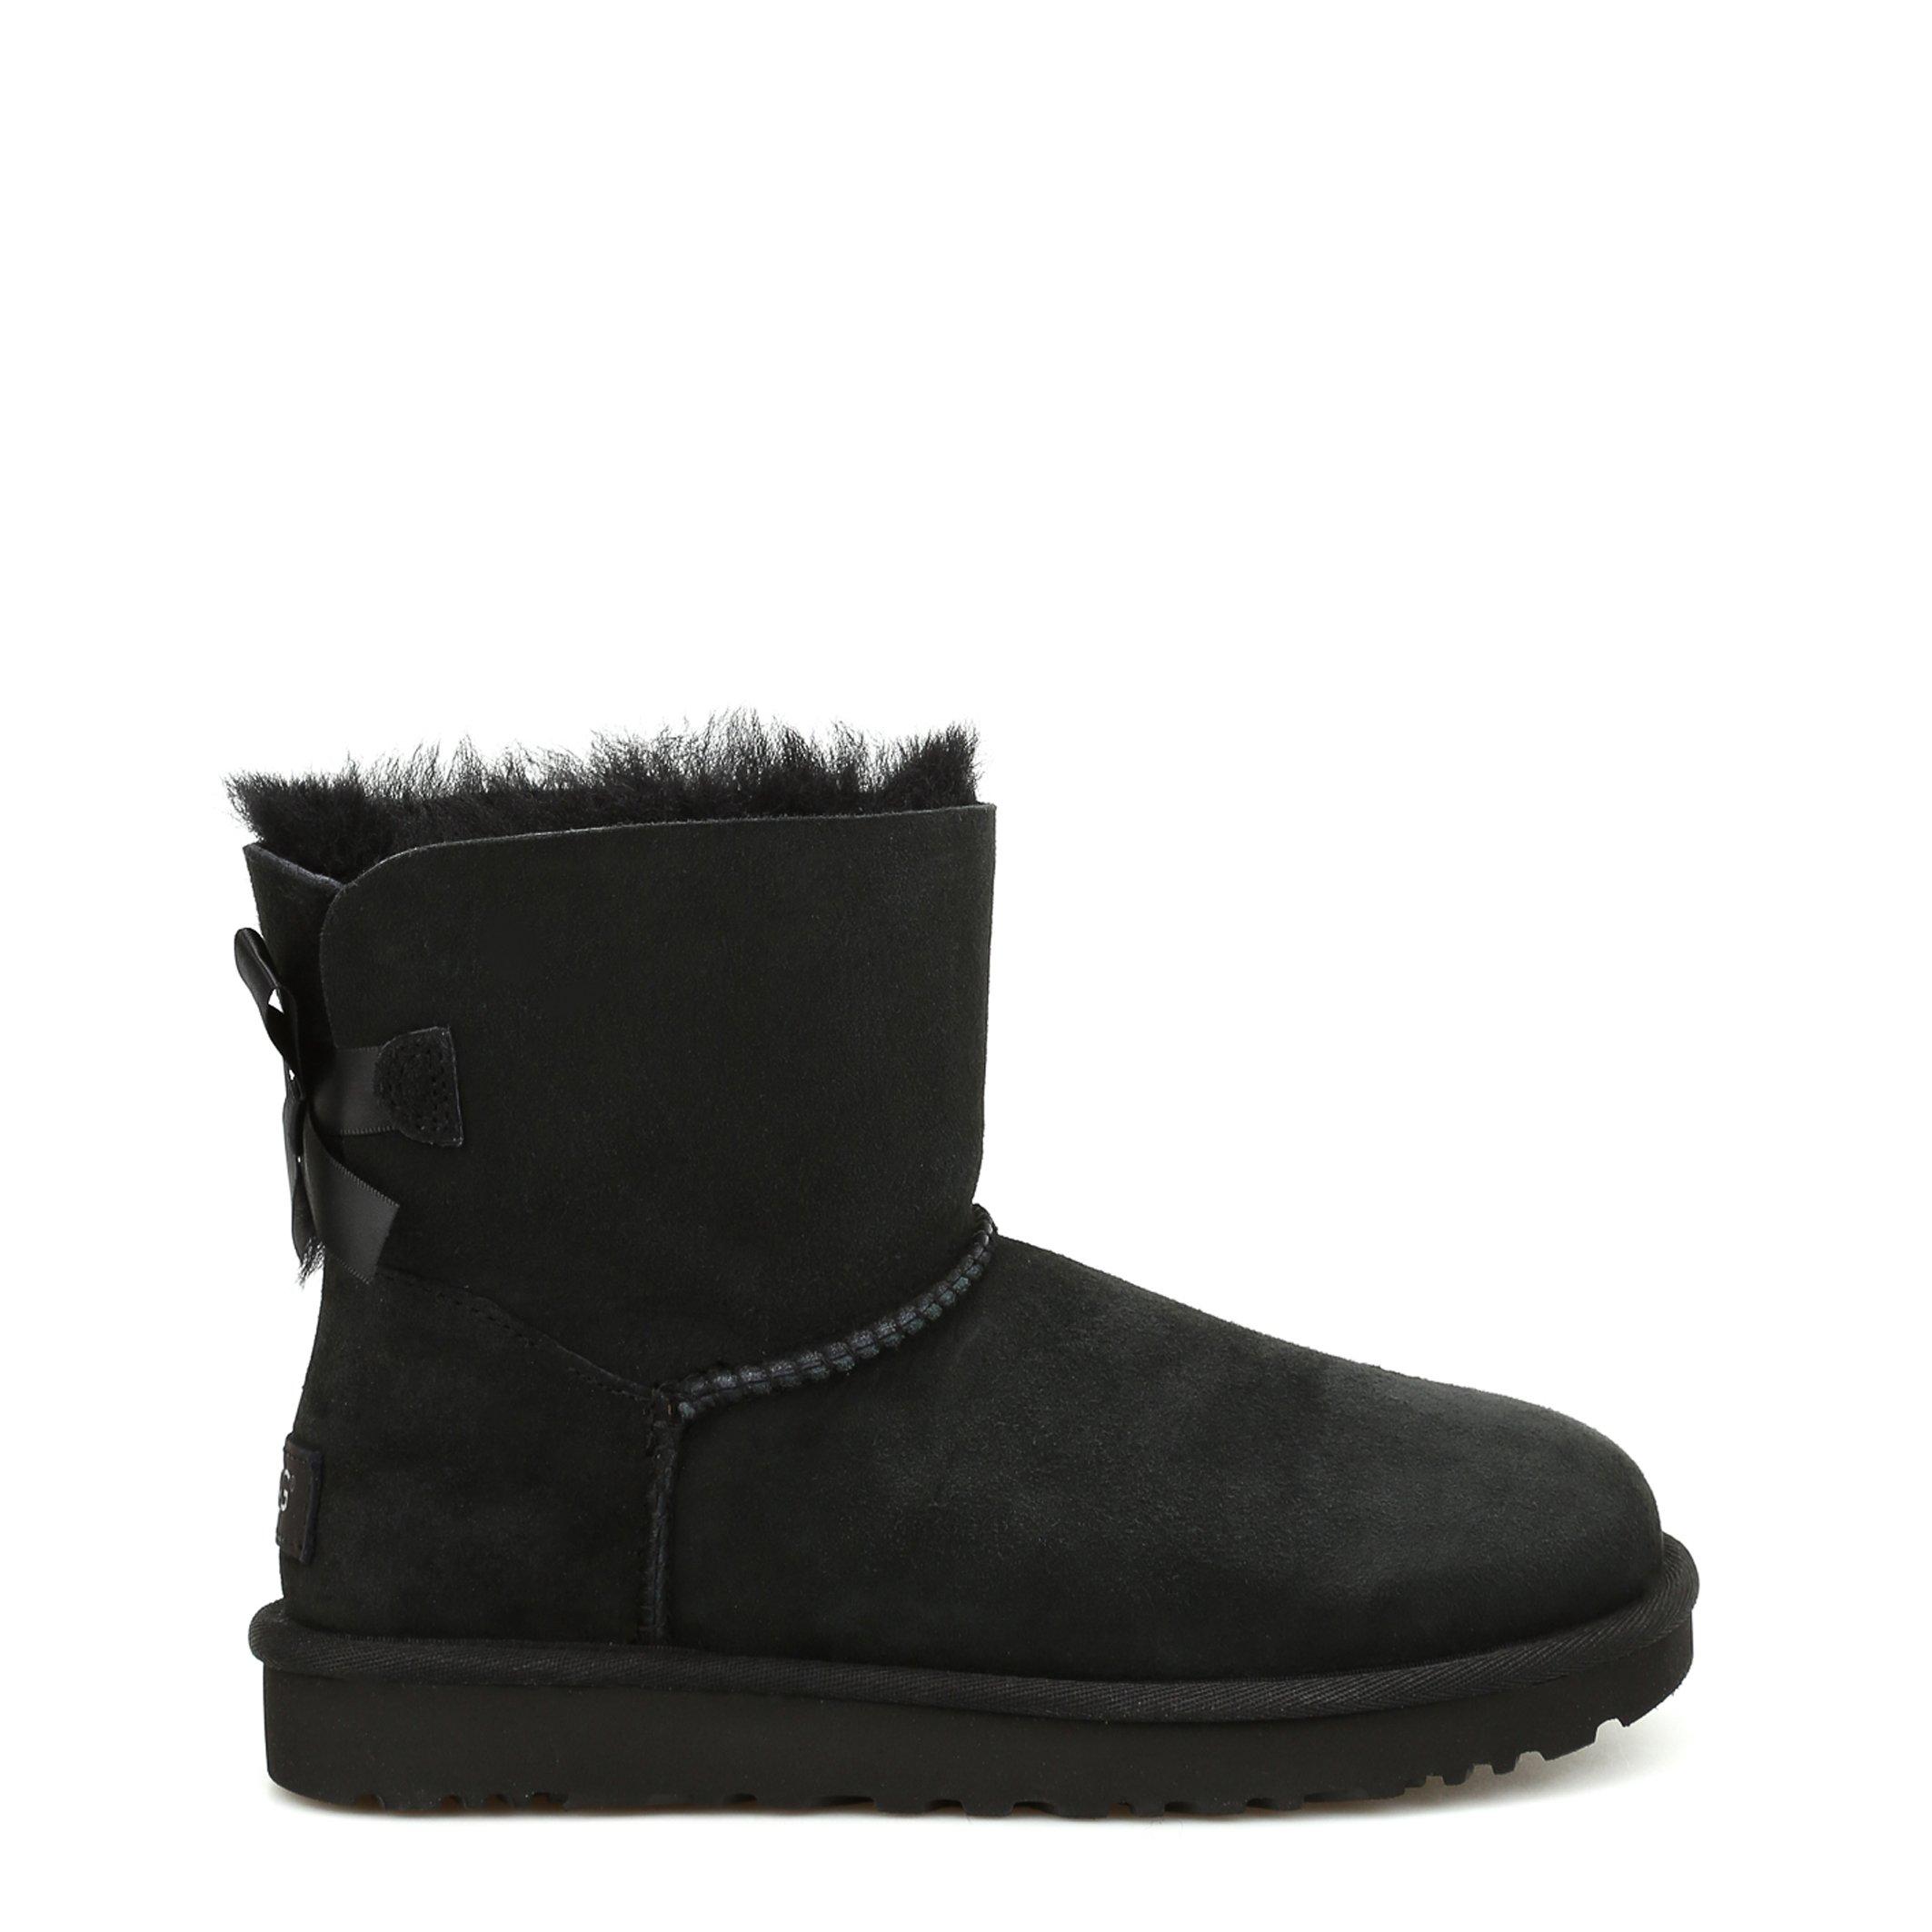 UGG Women's Ankle Boot Various Colours 1016501 - black EU 39